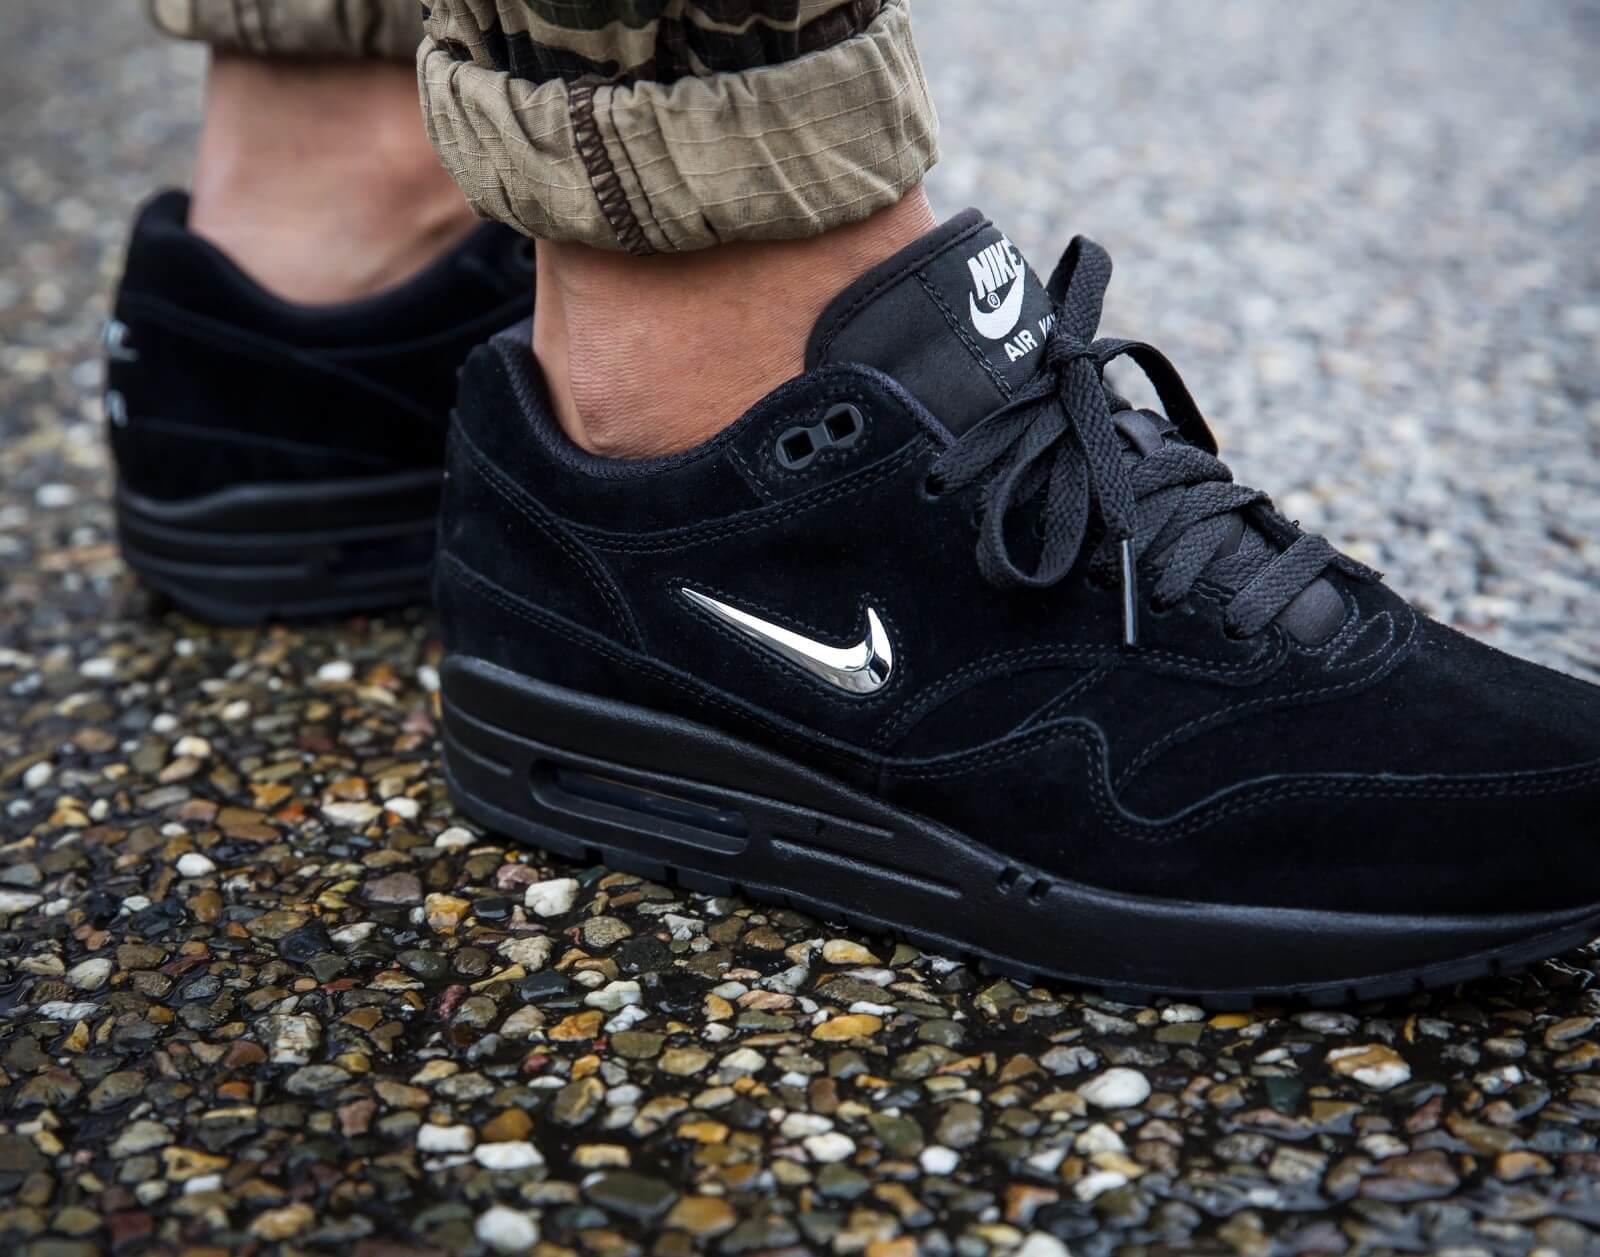 Nike Air Max 1 Premium SC BlackChrome Black 918354 005